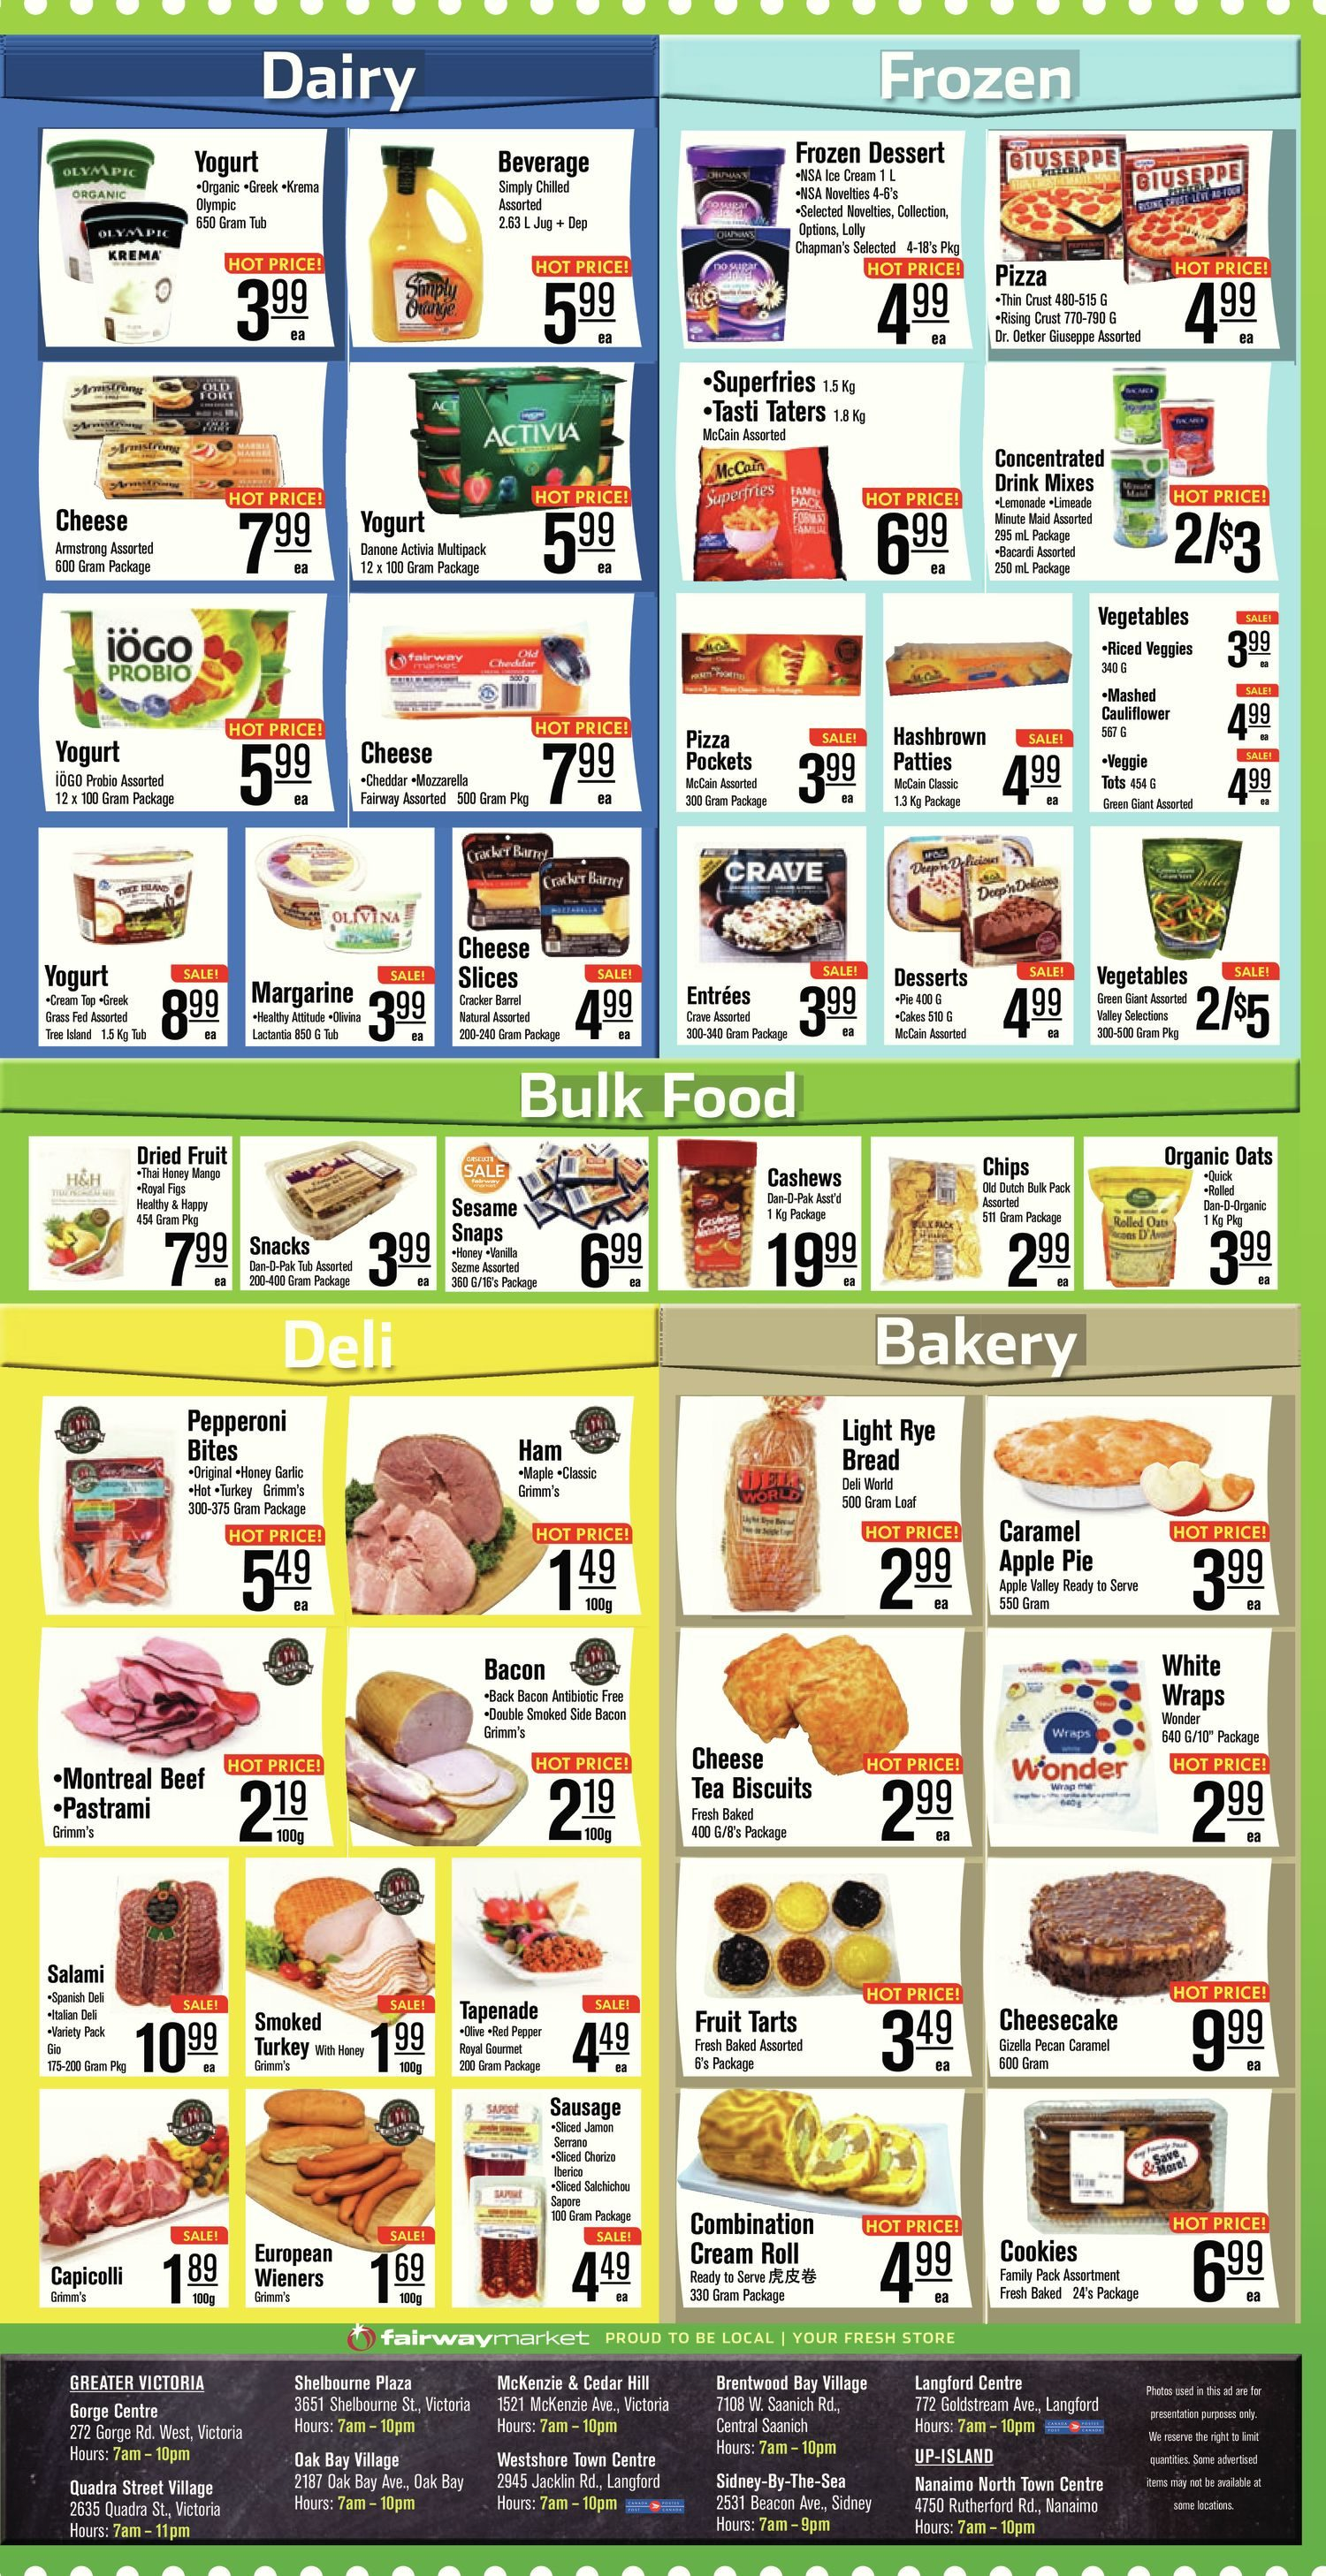 Harga Dan Spesifikasi Keju Kraft Cheddar 175 Grm Terbaru 2018 Stripe Set R Brown Vario 150 Esp 871x0k59a00zdr Fairway Market Weekly Flyer Specials Buy Big Save Aug 24 30